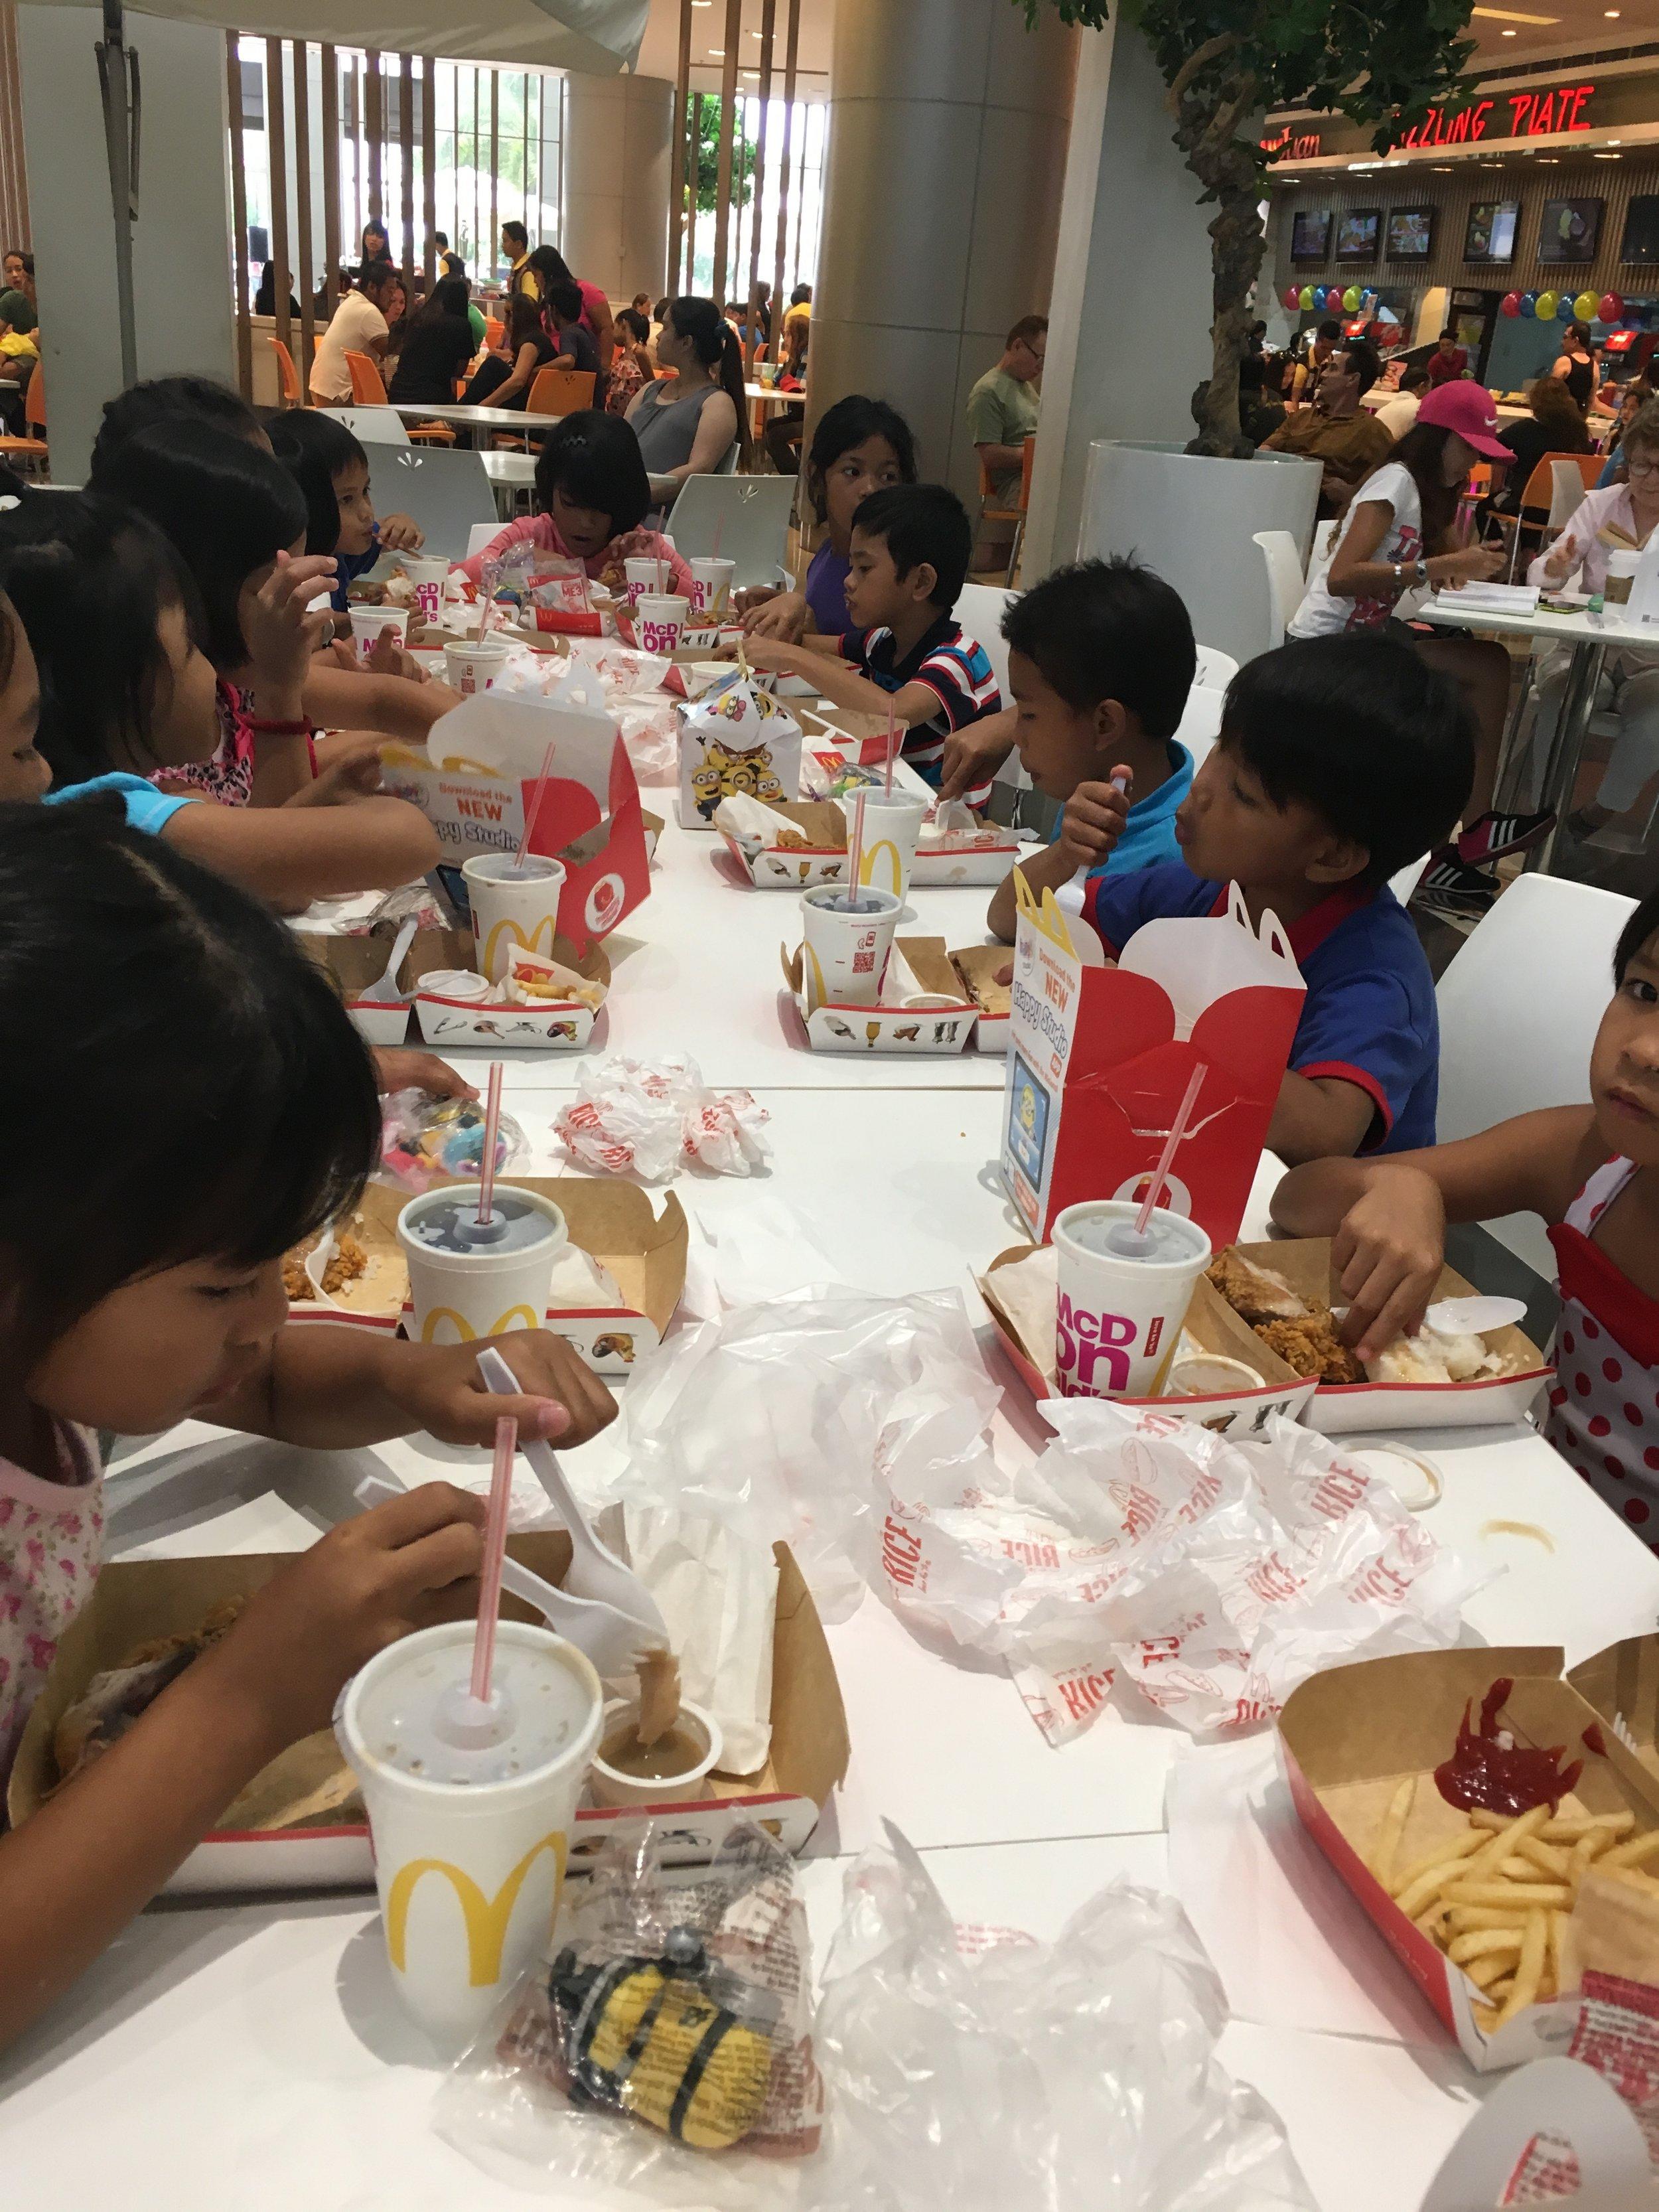 Post church McDonald's trip at the mall.